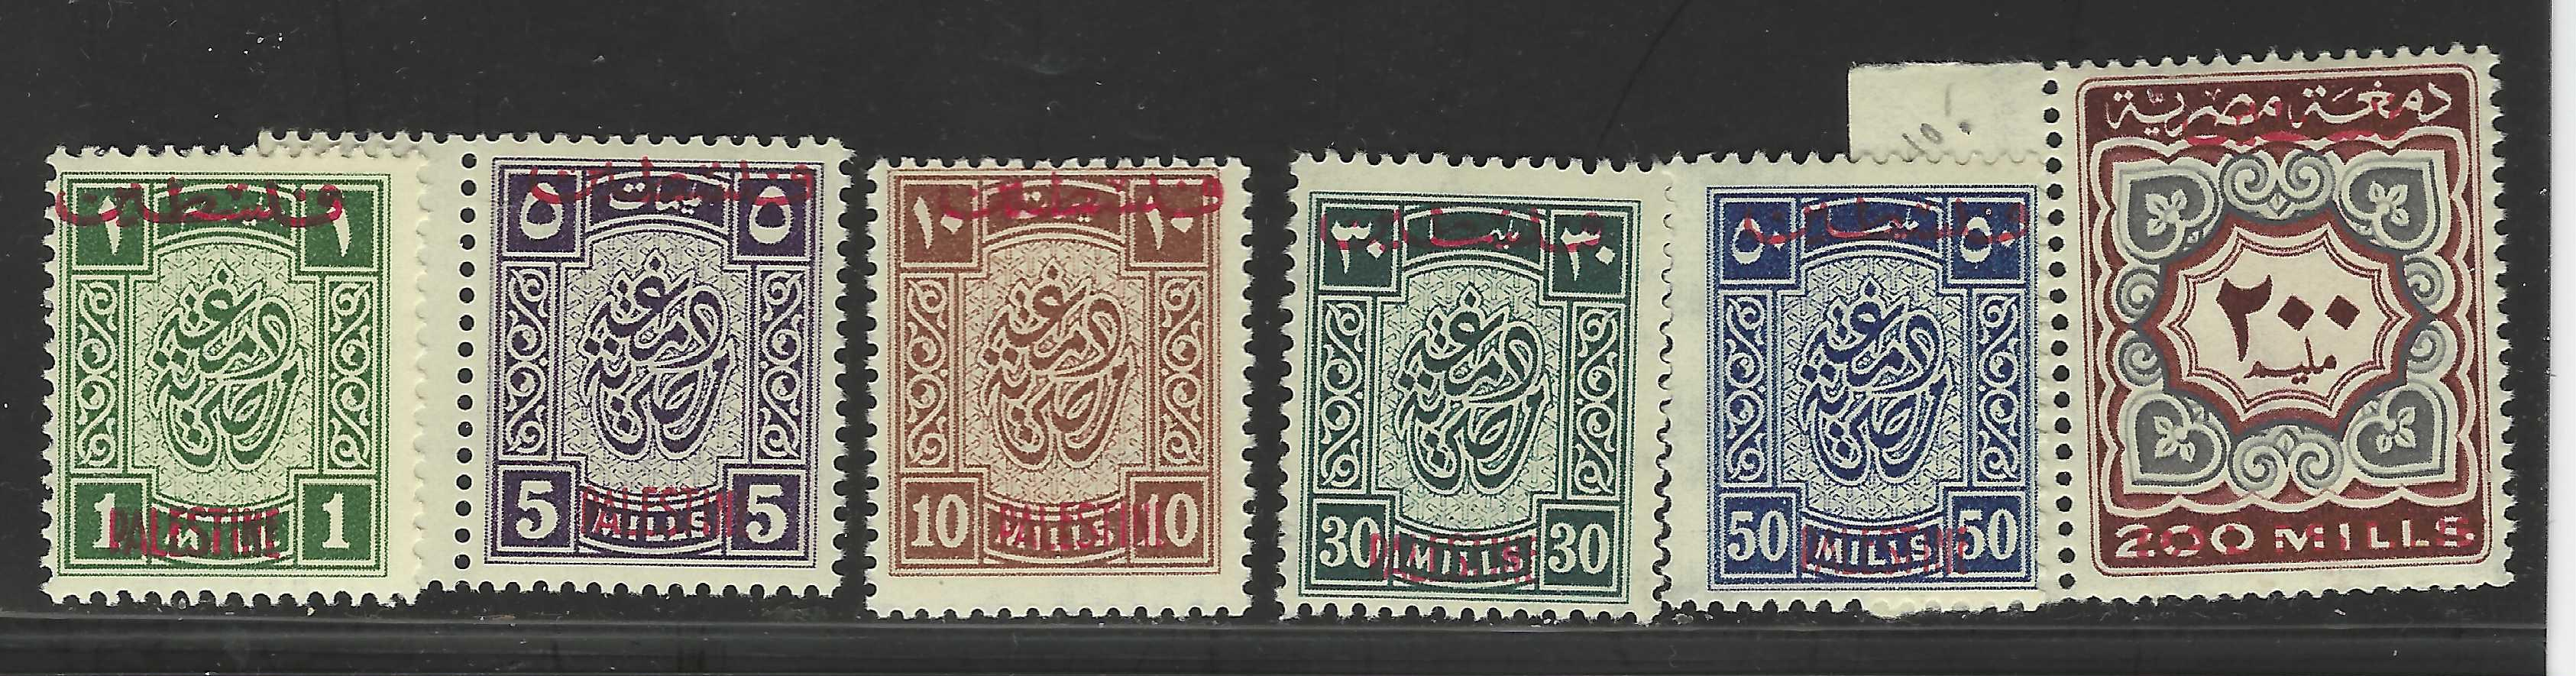 Lot 396 - arabic Egypt & Gaza / Sinai 1948 - 1967 -  Negev Holyland 94th Holyland Postal Bid Sale